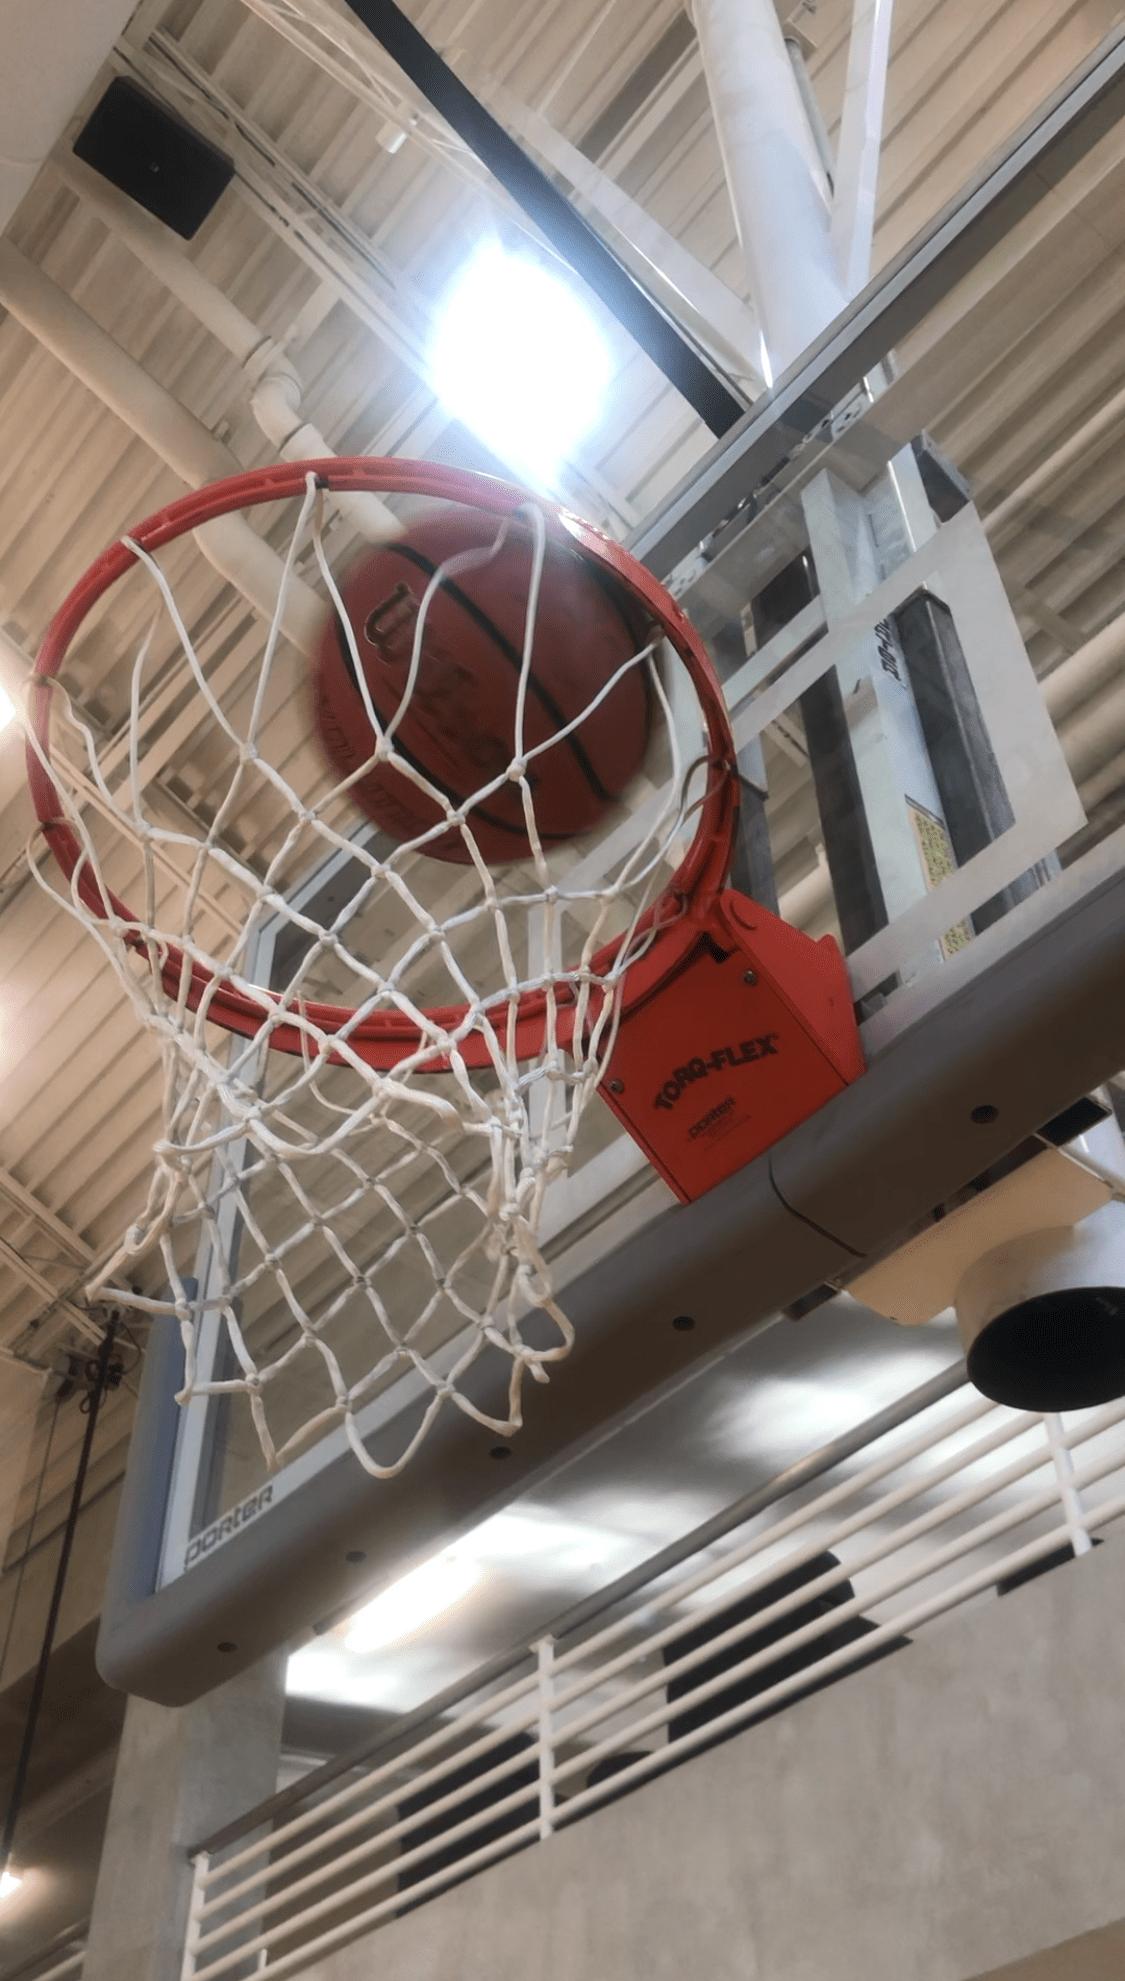 A basketball goes through a basketball hoop